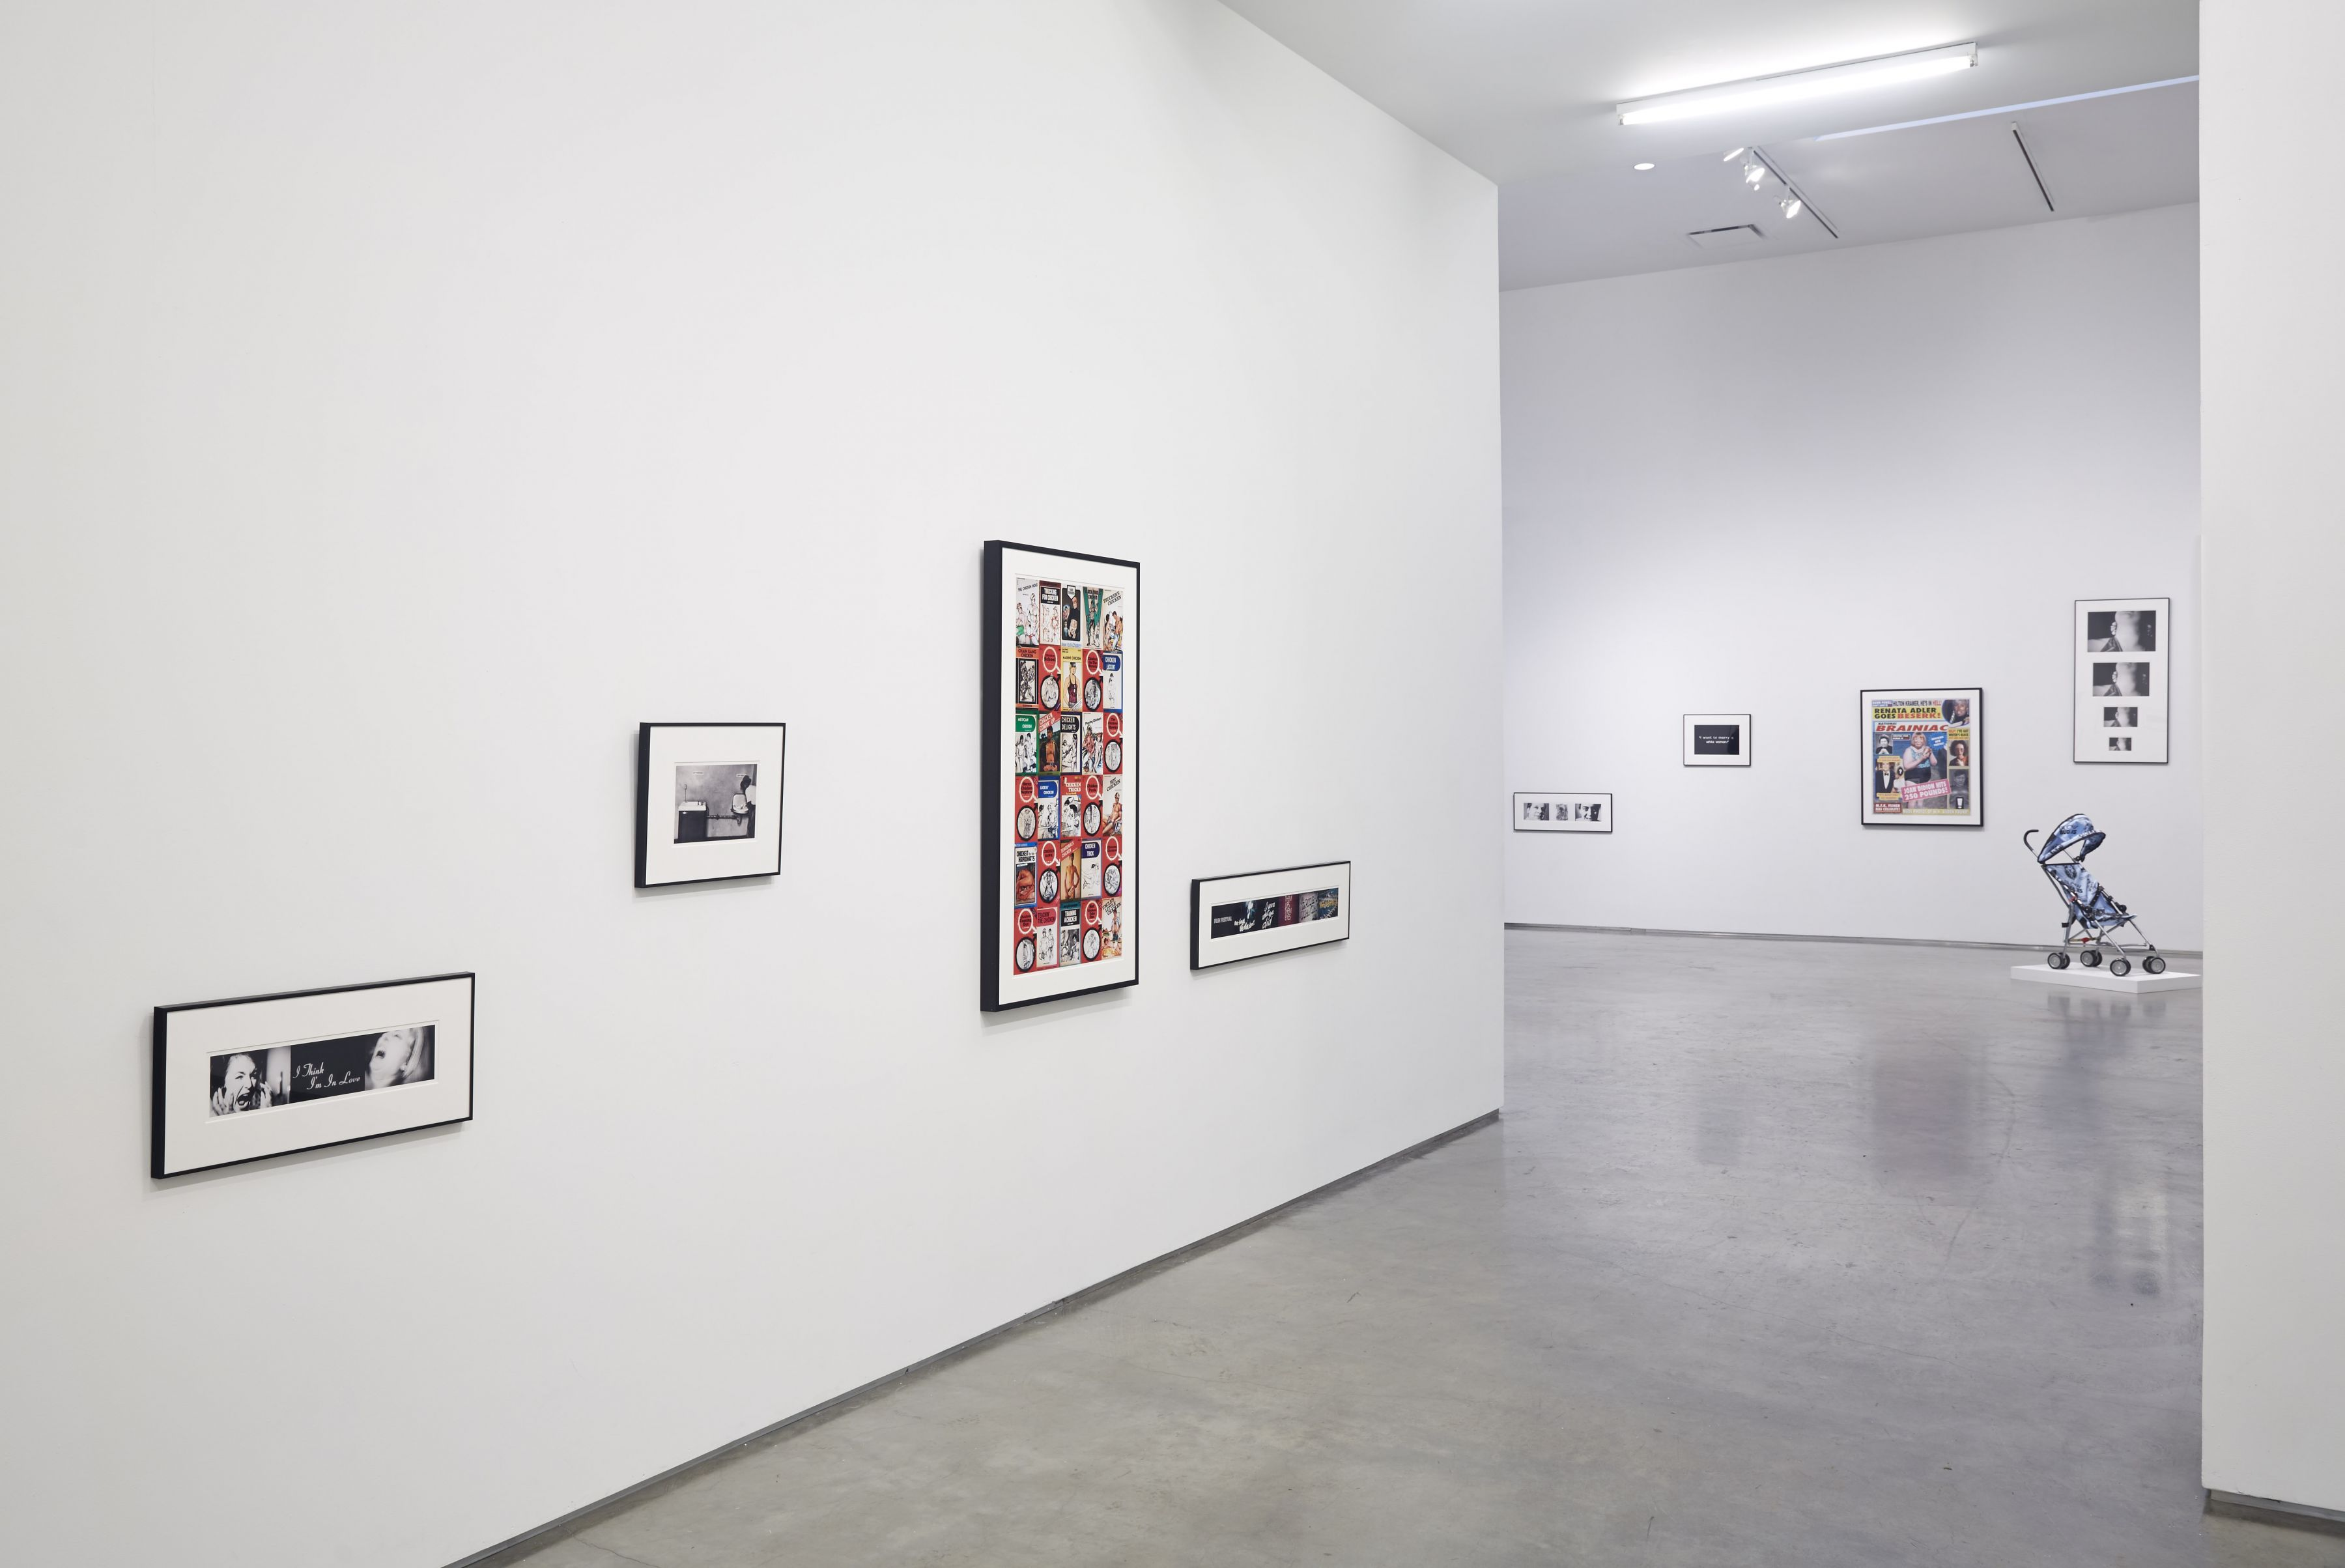 Beverly Hills John(Installation View), Marianne Boesky Gallery, 2015